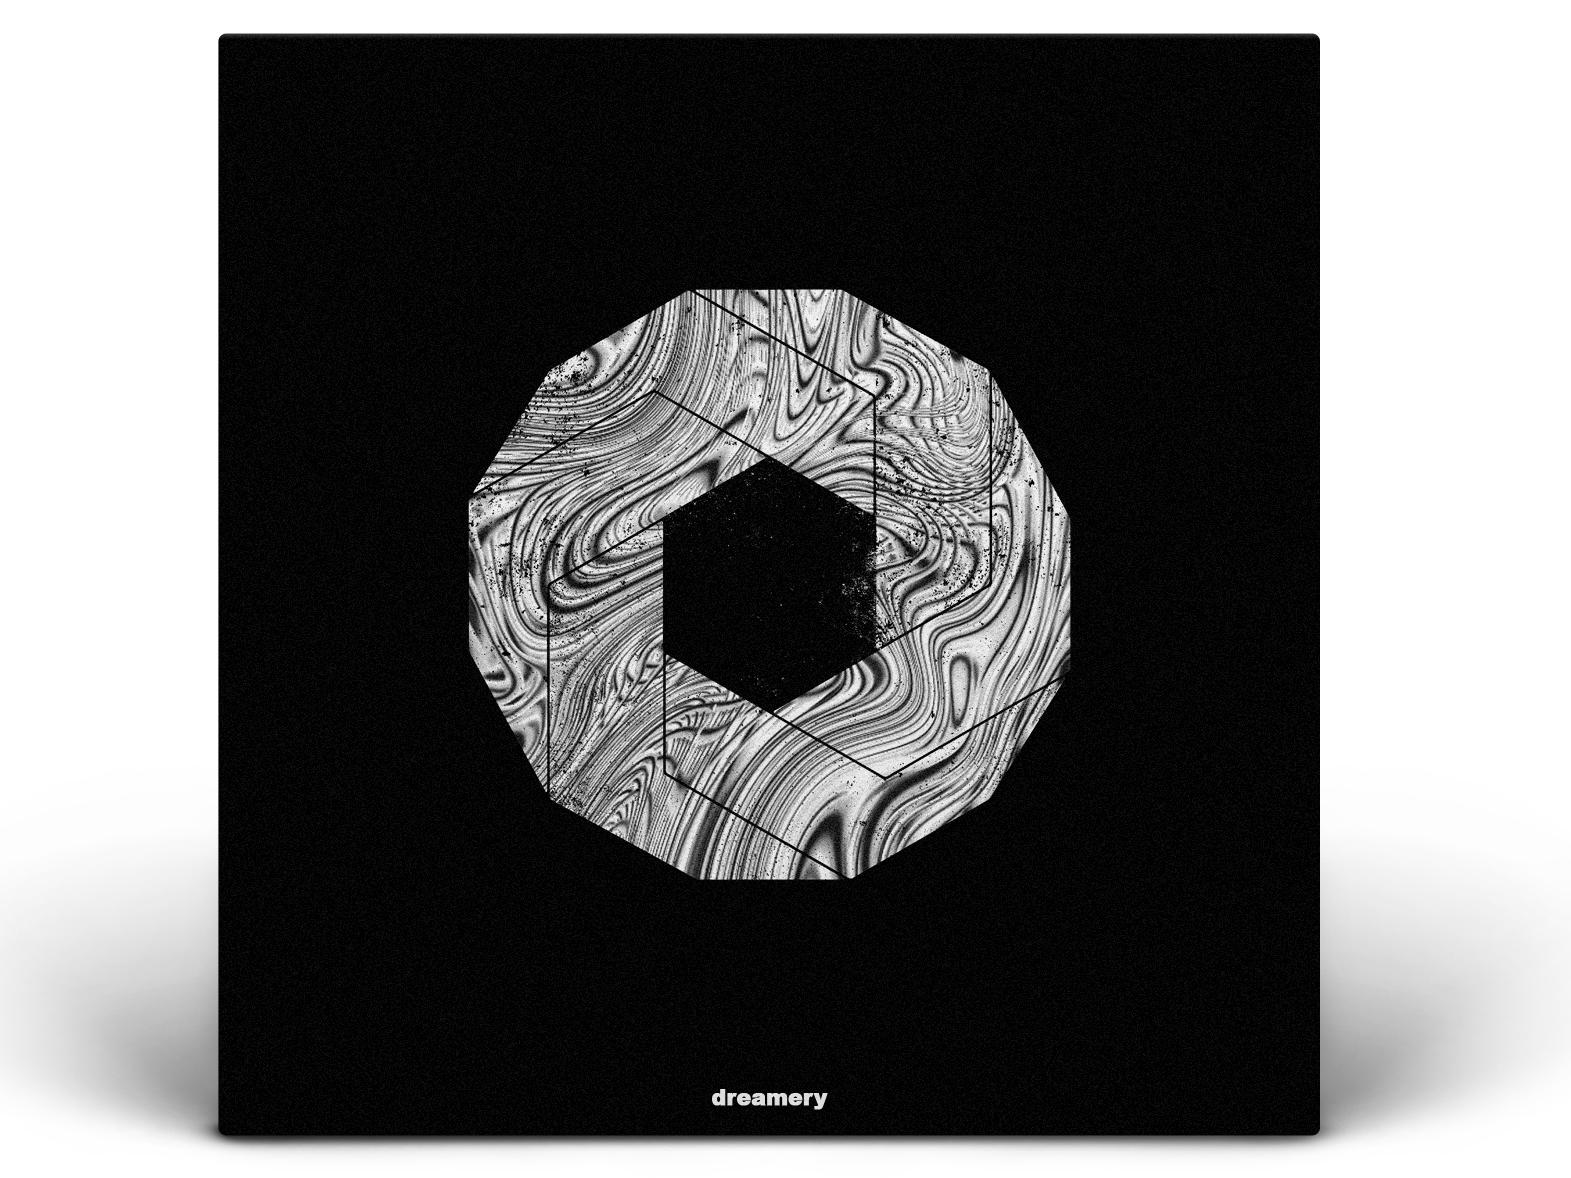 dreamery music metal black  white calm geometry light abstract gradiant album album cover design album cover album artwork album art illustration design lachute